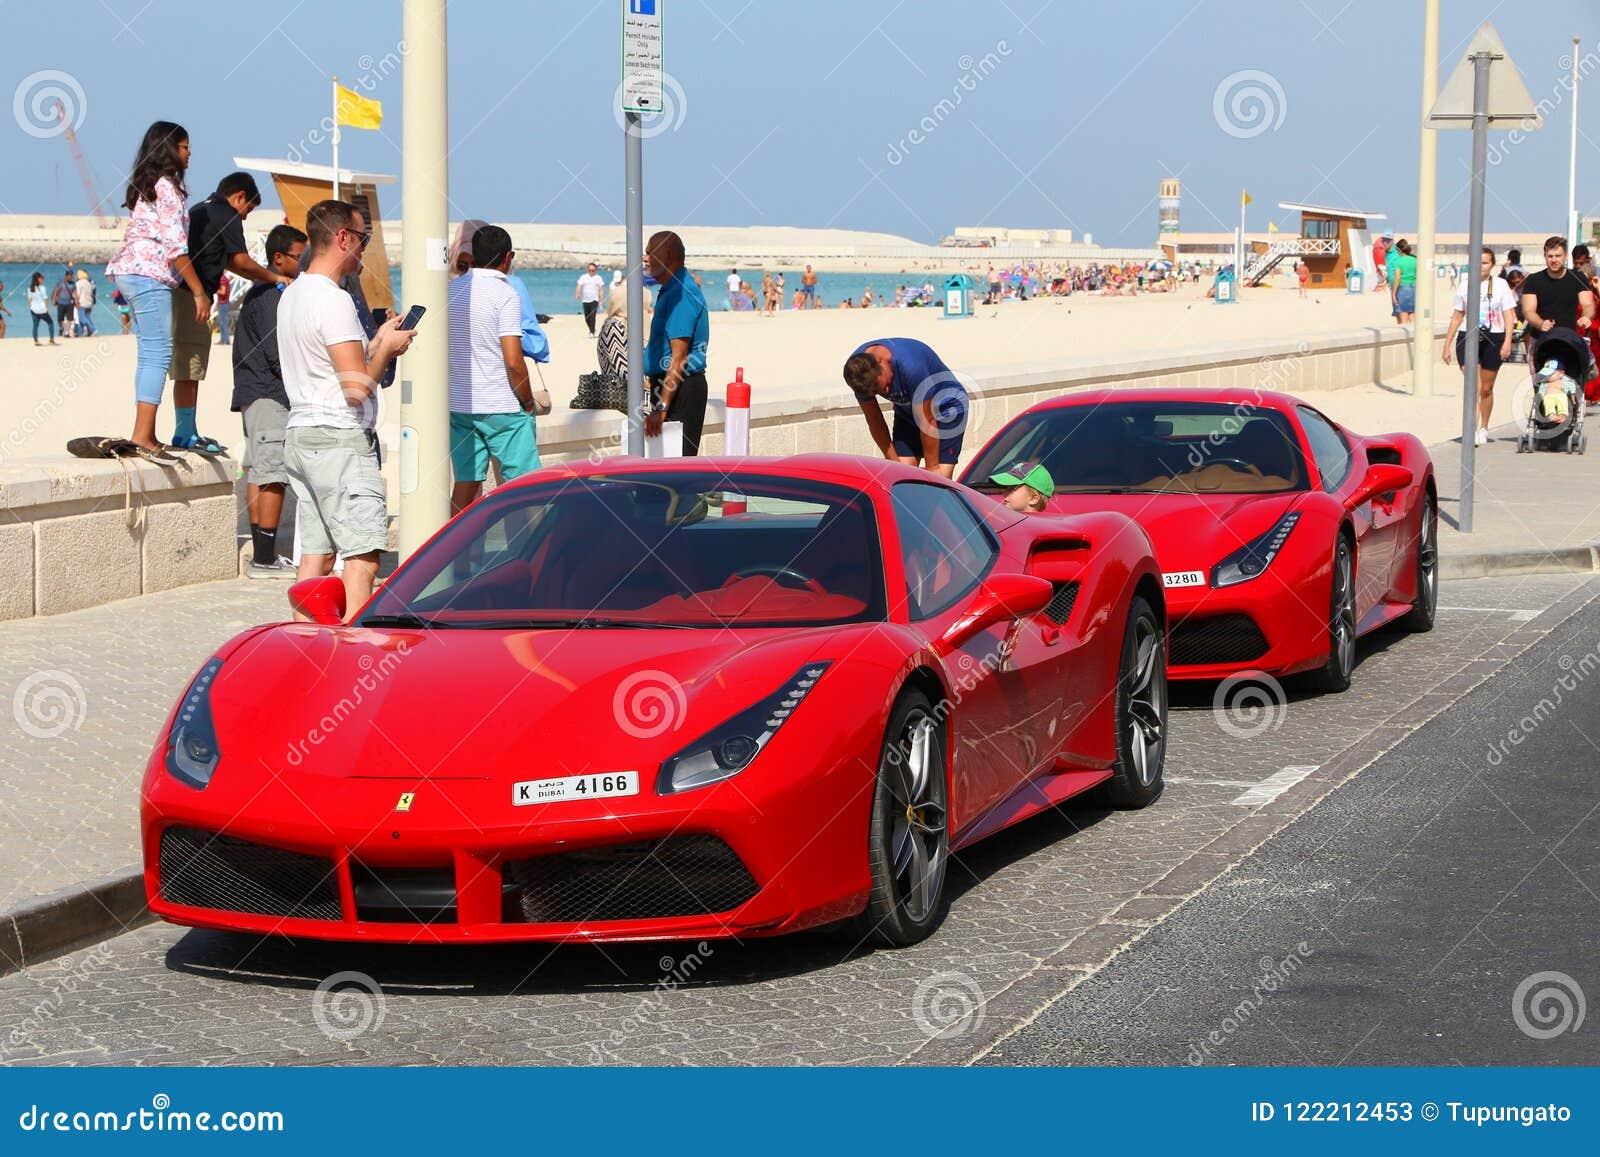 Ferrari Cars In Dubai Editorial Stock Photo Image Of Ferrari